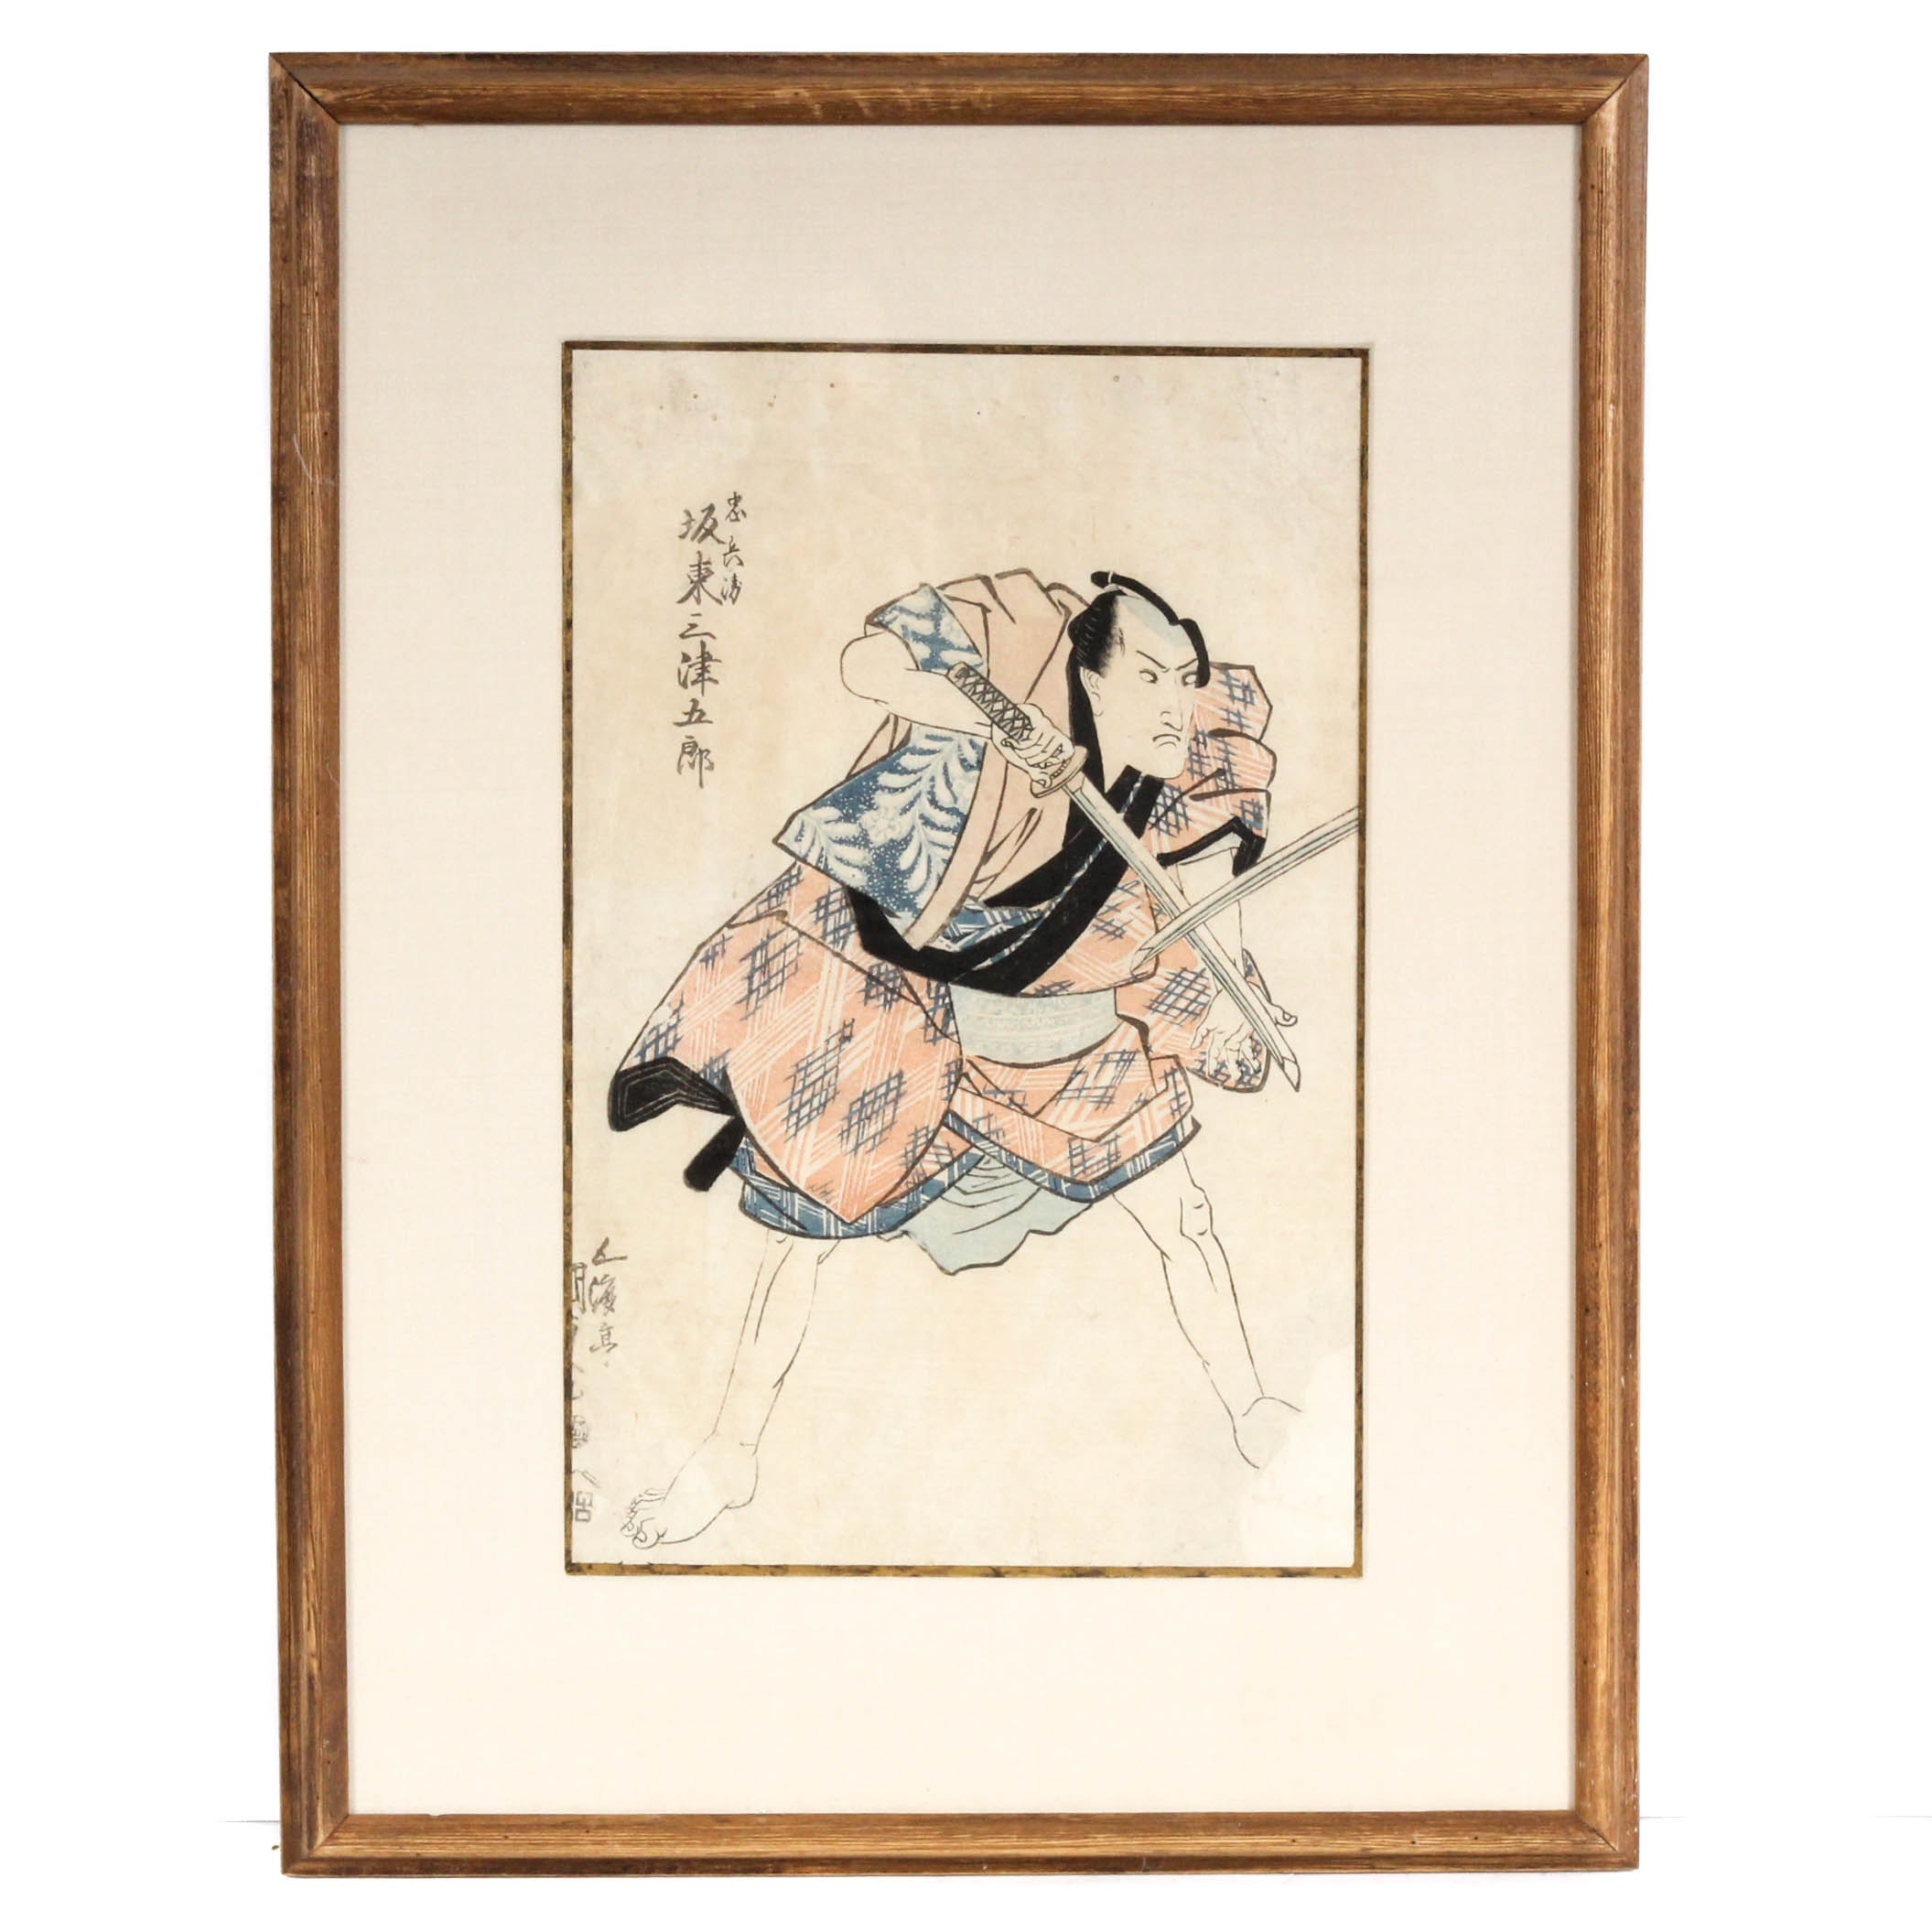 1830 Kumsada Utagawa Japanese Woodblock Print